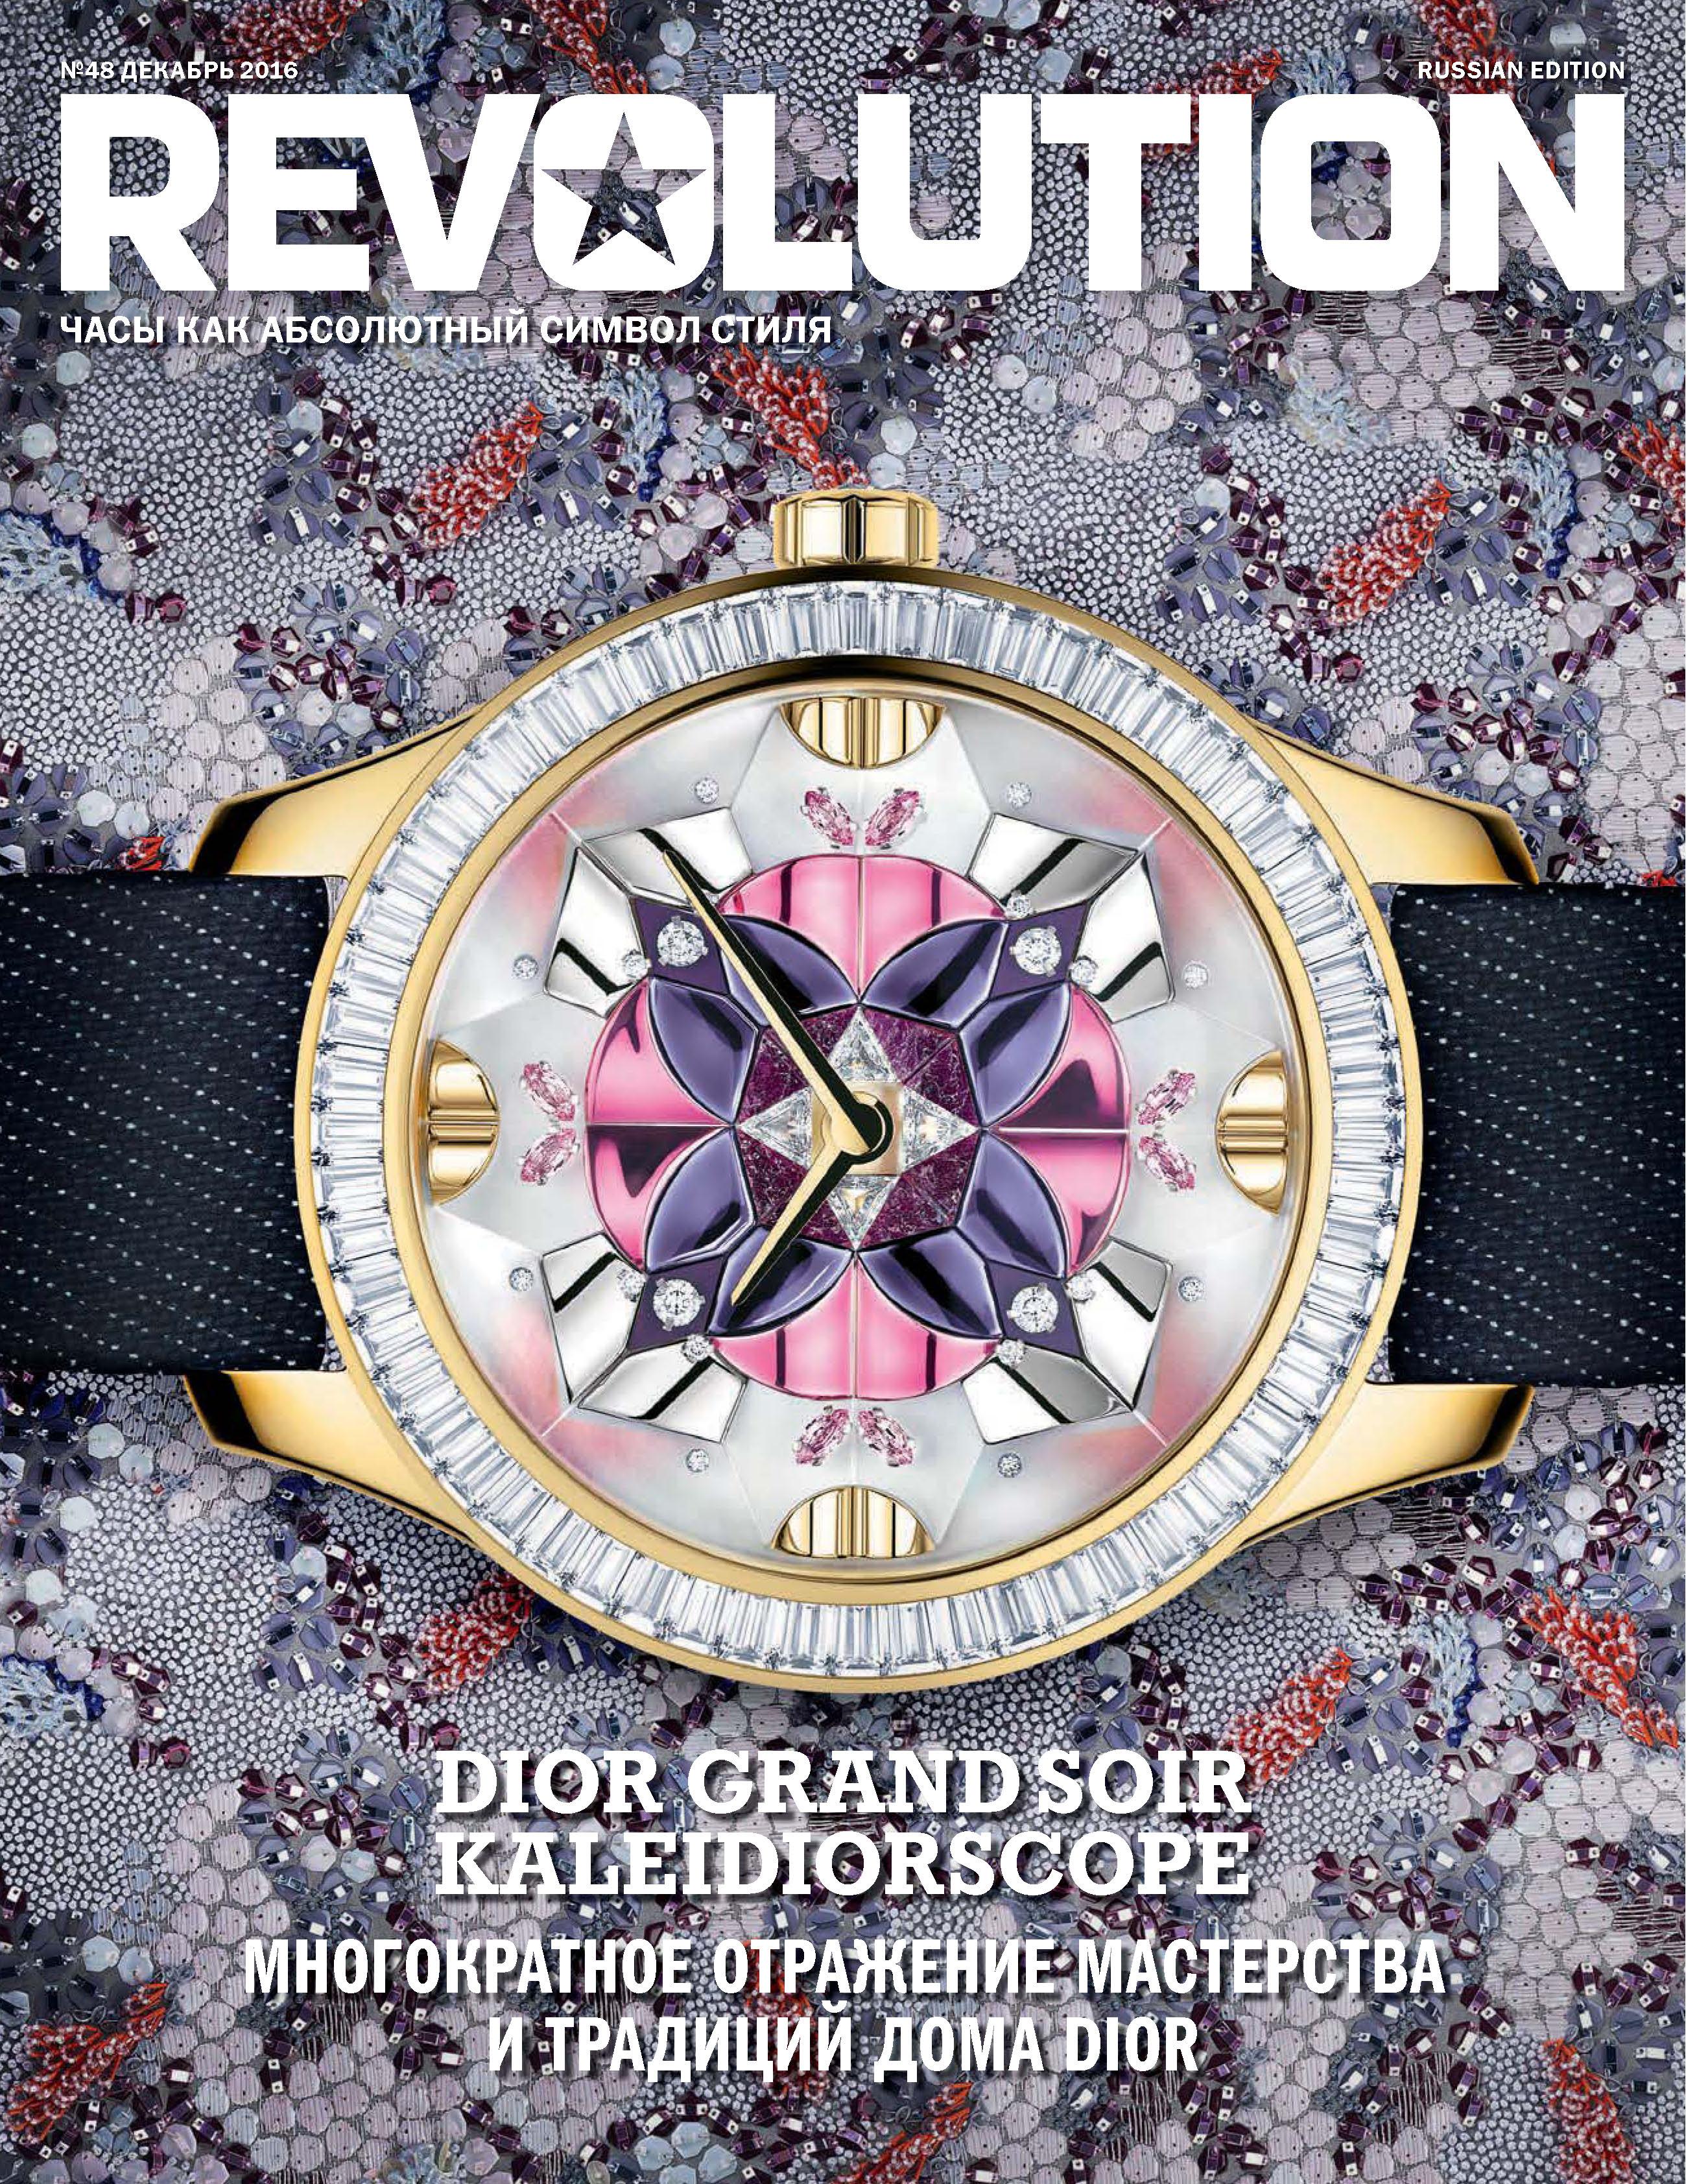 ИД «Бурда» Журнал Revolution №48,декабрь 2016 часы jaeger lecoultre q1926450